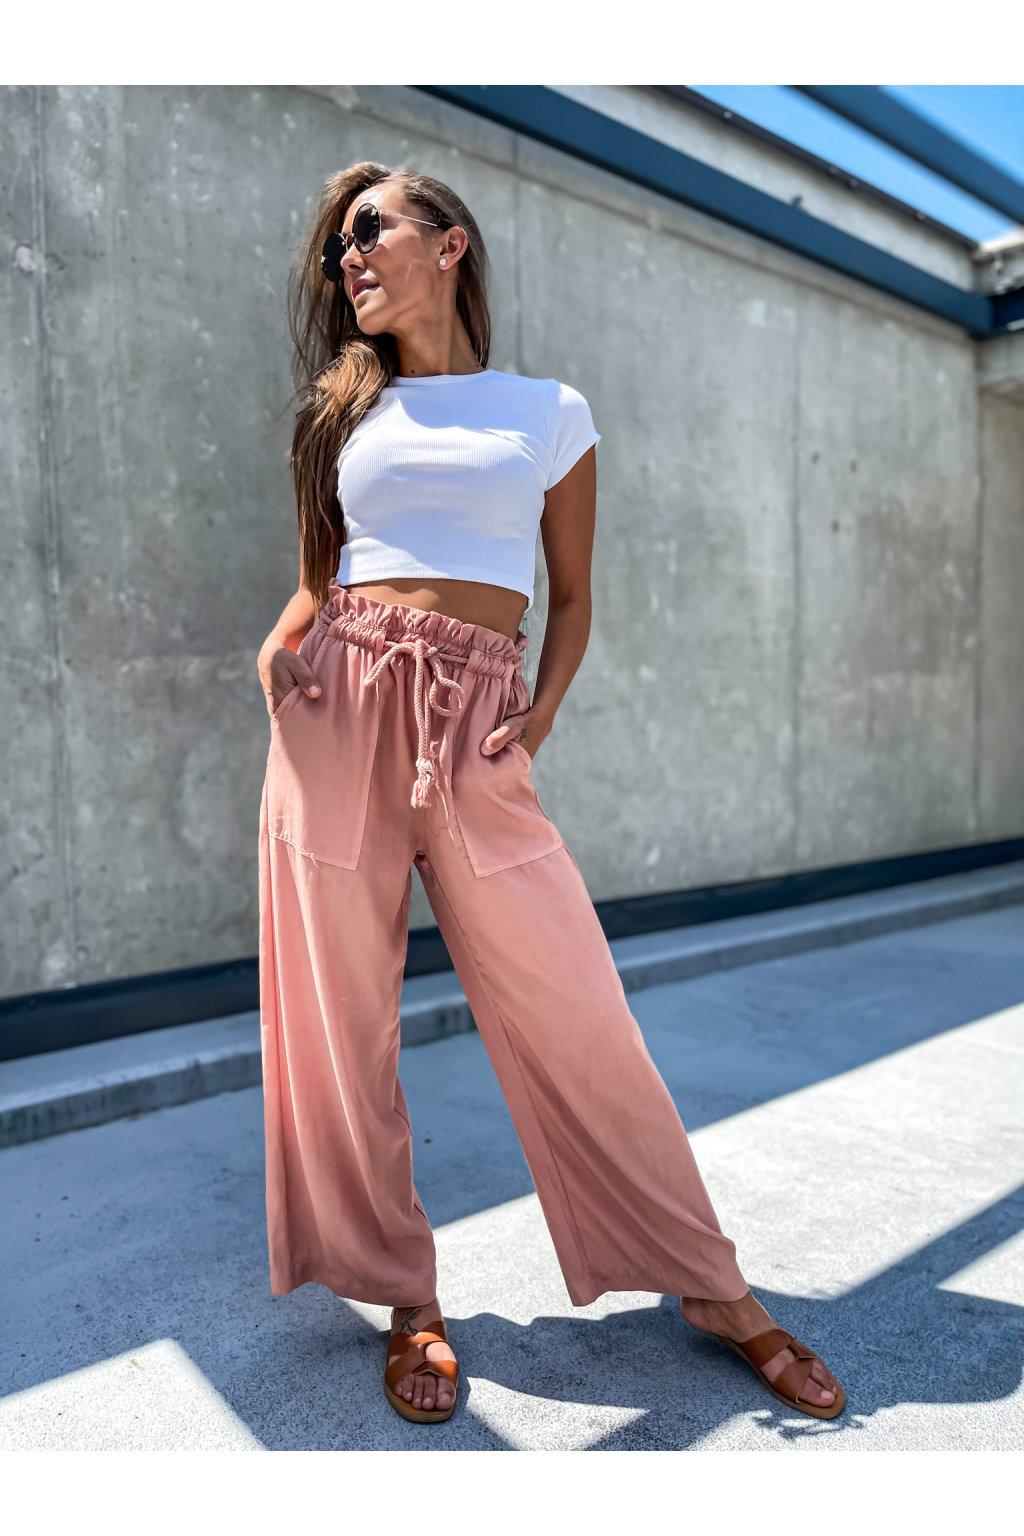 damske kalhoty cannes powder pink eshopat cz 3